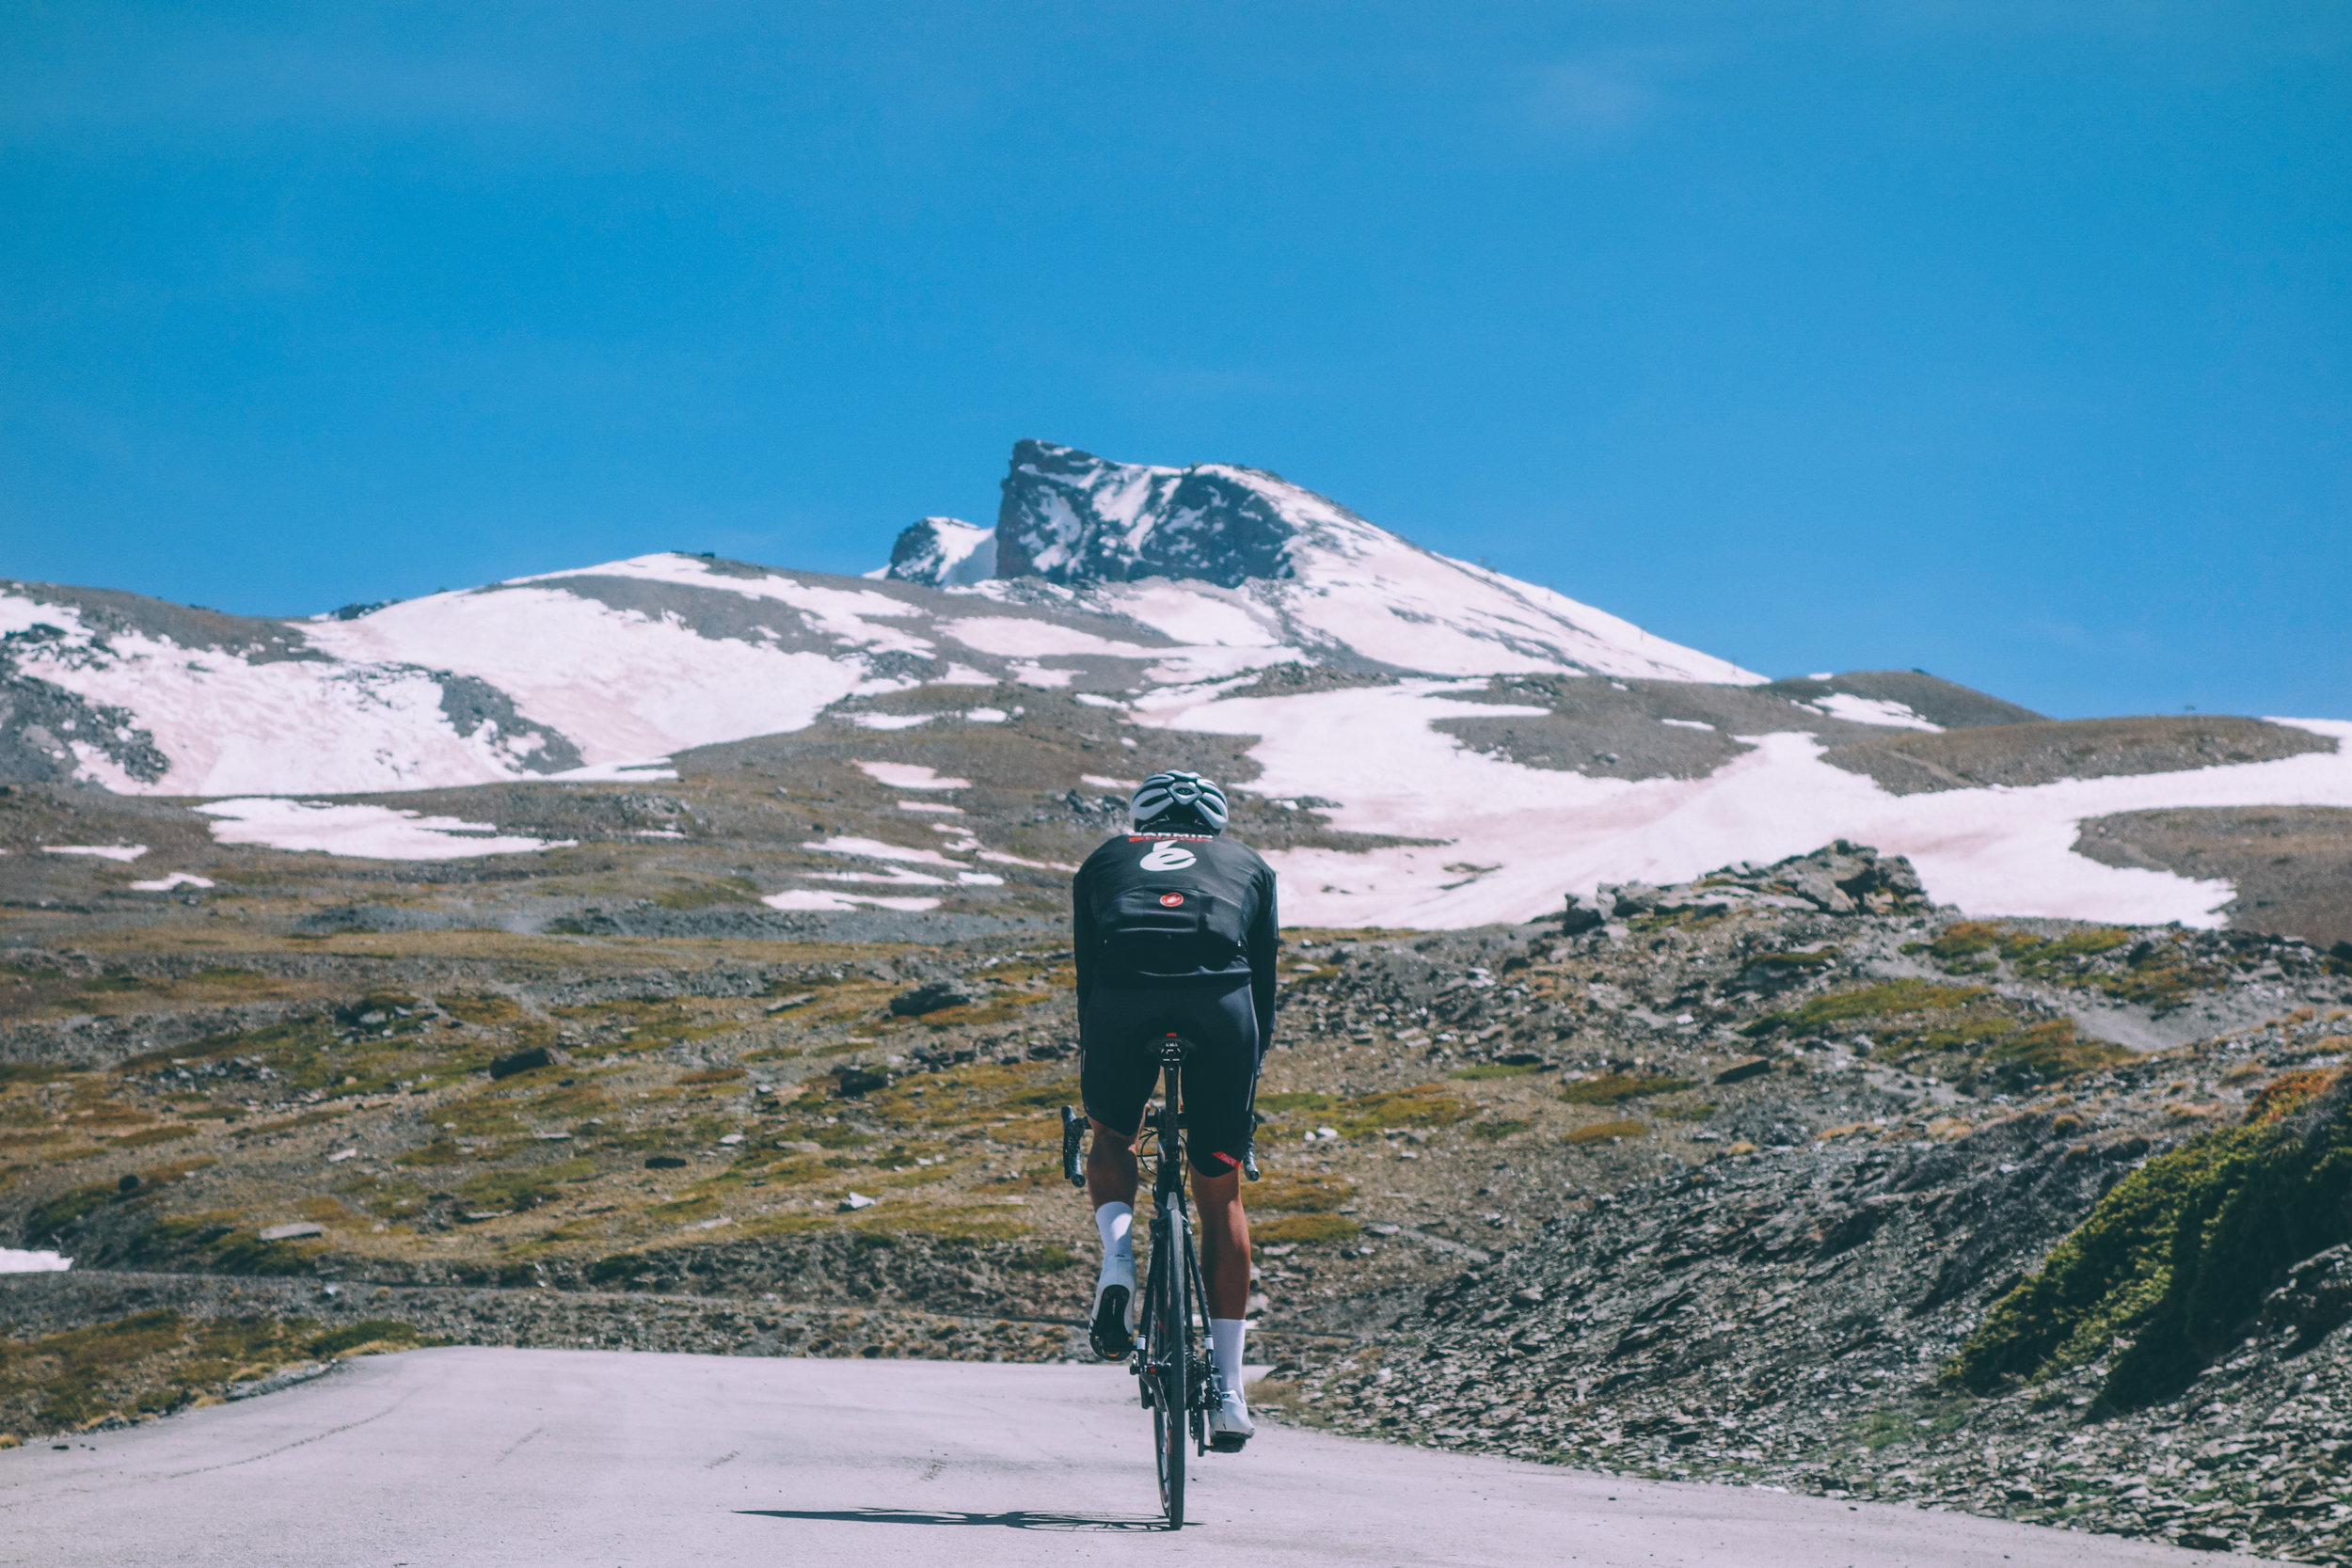 PICO DE VELETA - EUROPE'S HIGHEST PAVED ROAD